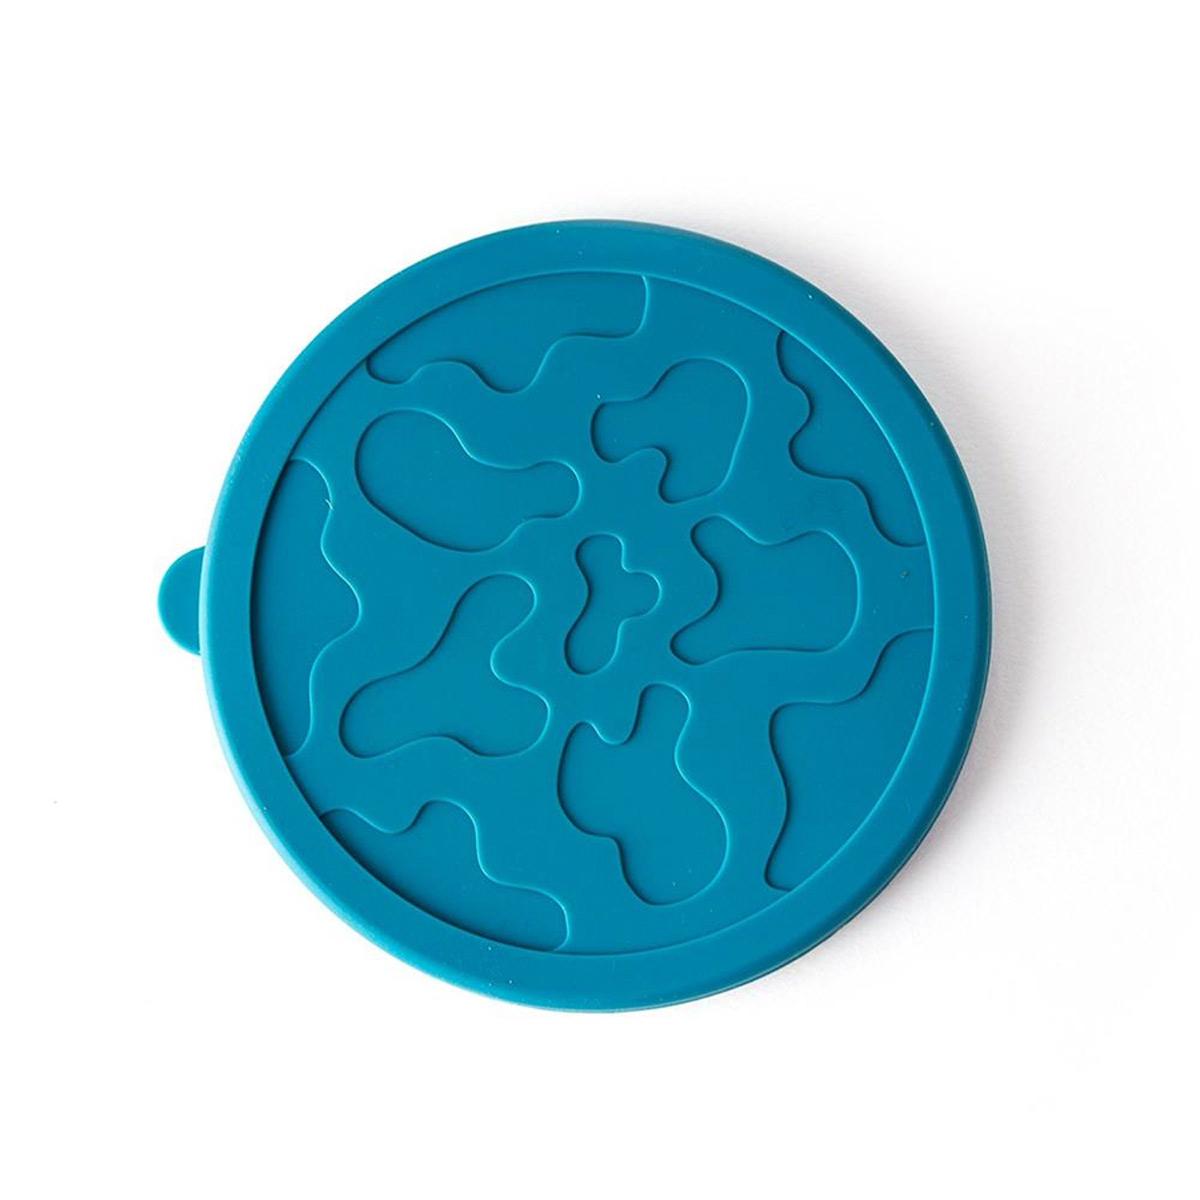 Seal Cup XL matlåda EcoLunchbox tättslutande silikonlock 760 ml